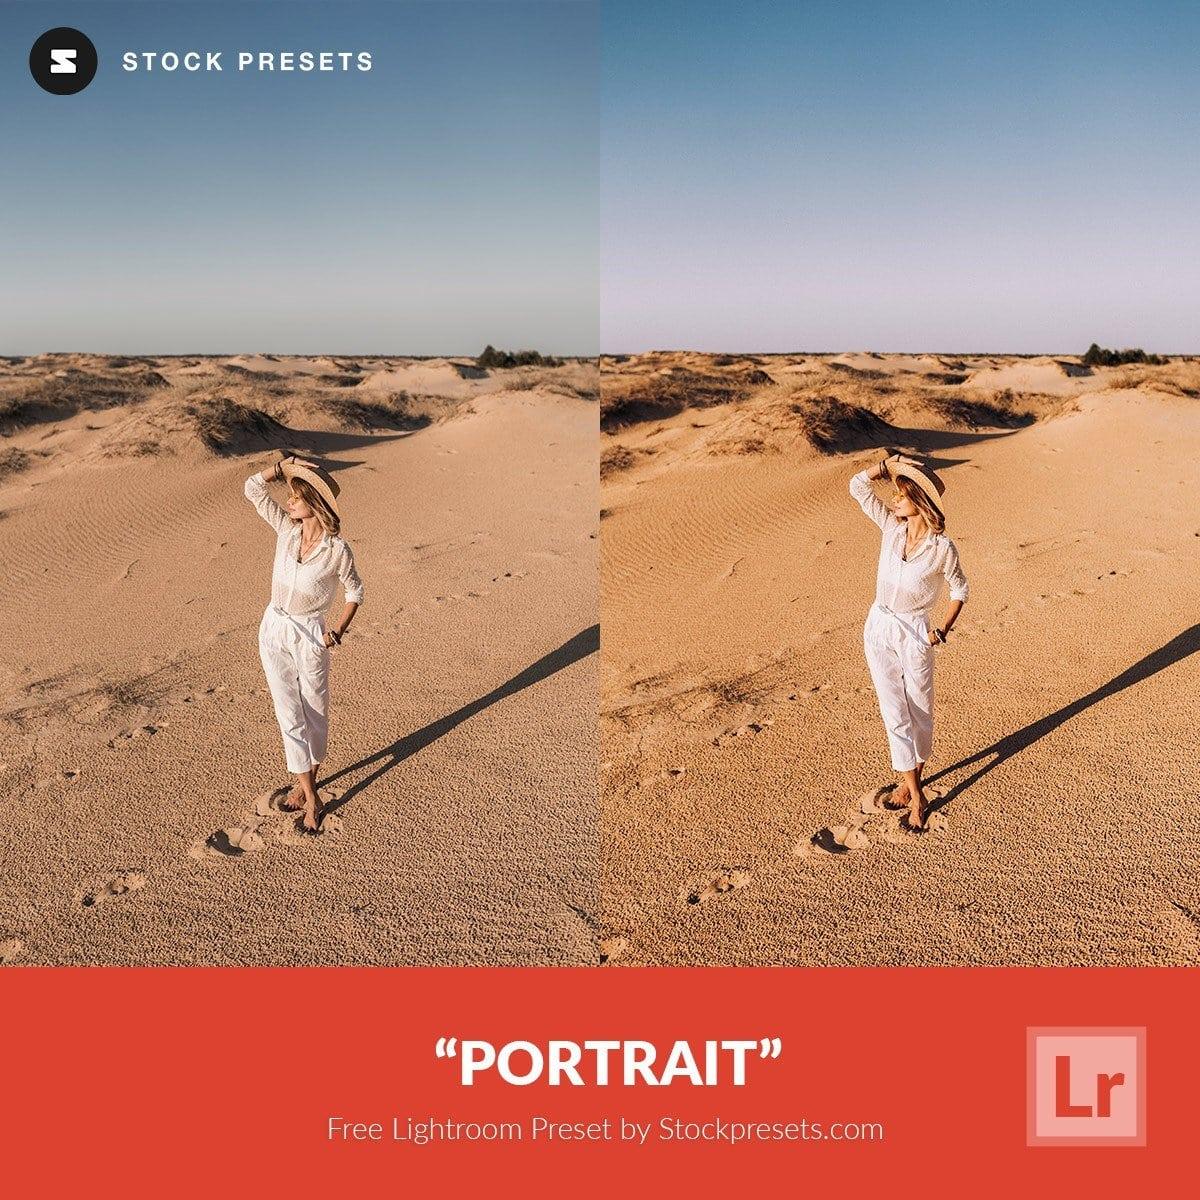 Free-Lightroom-Preset-Portrait-Preset-Stockpresets.com